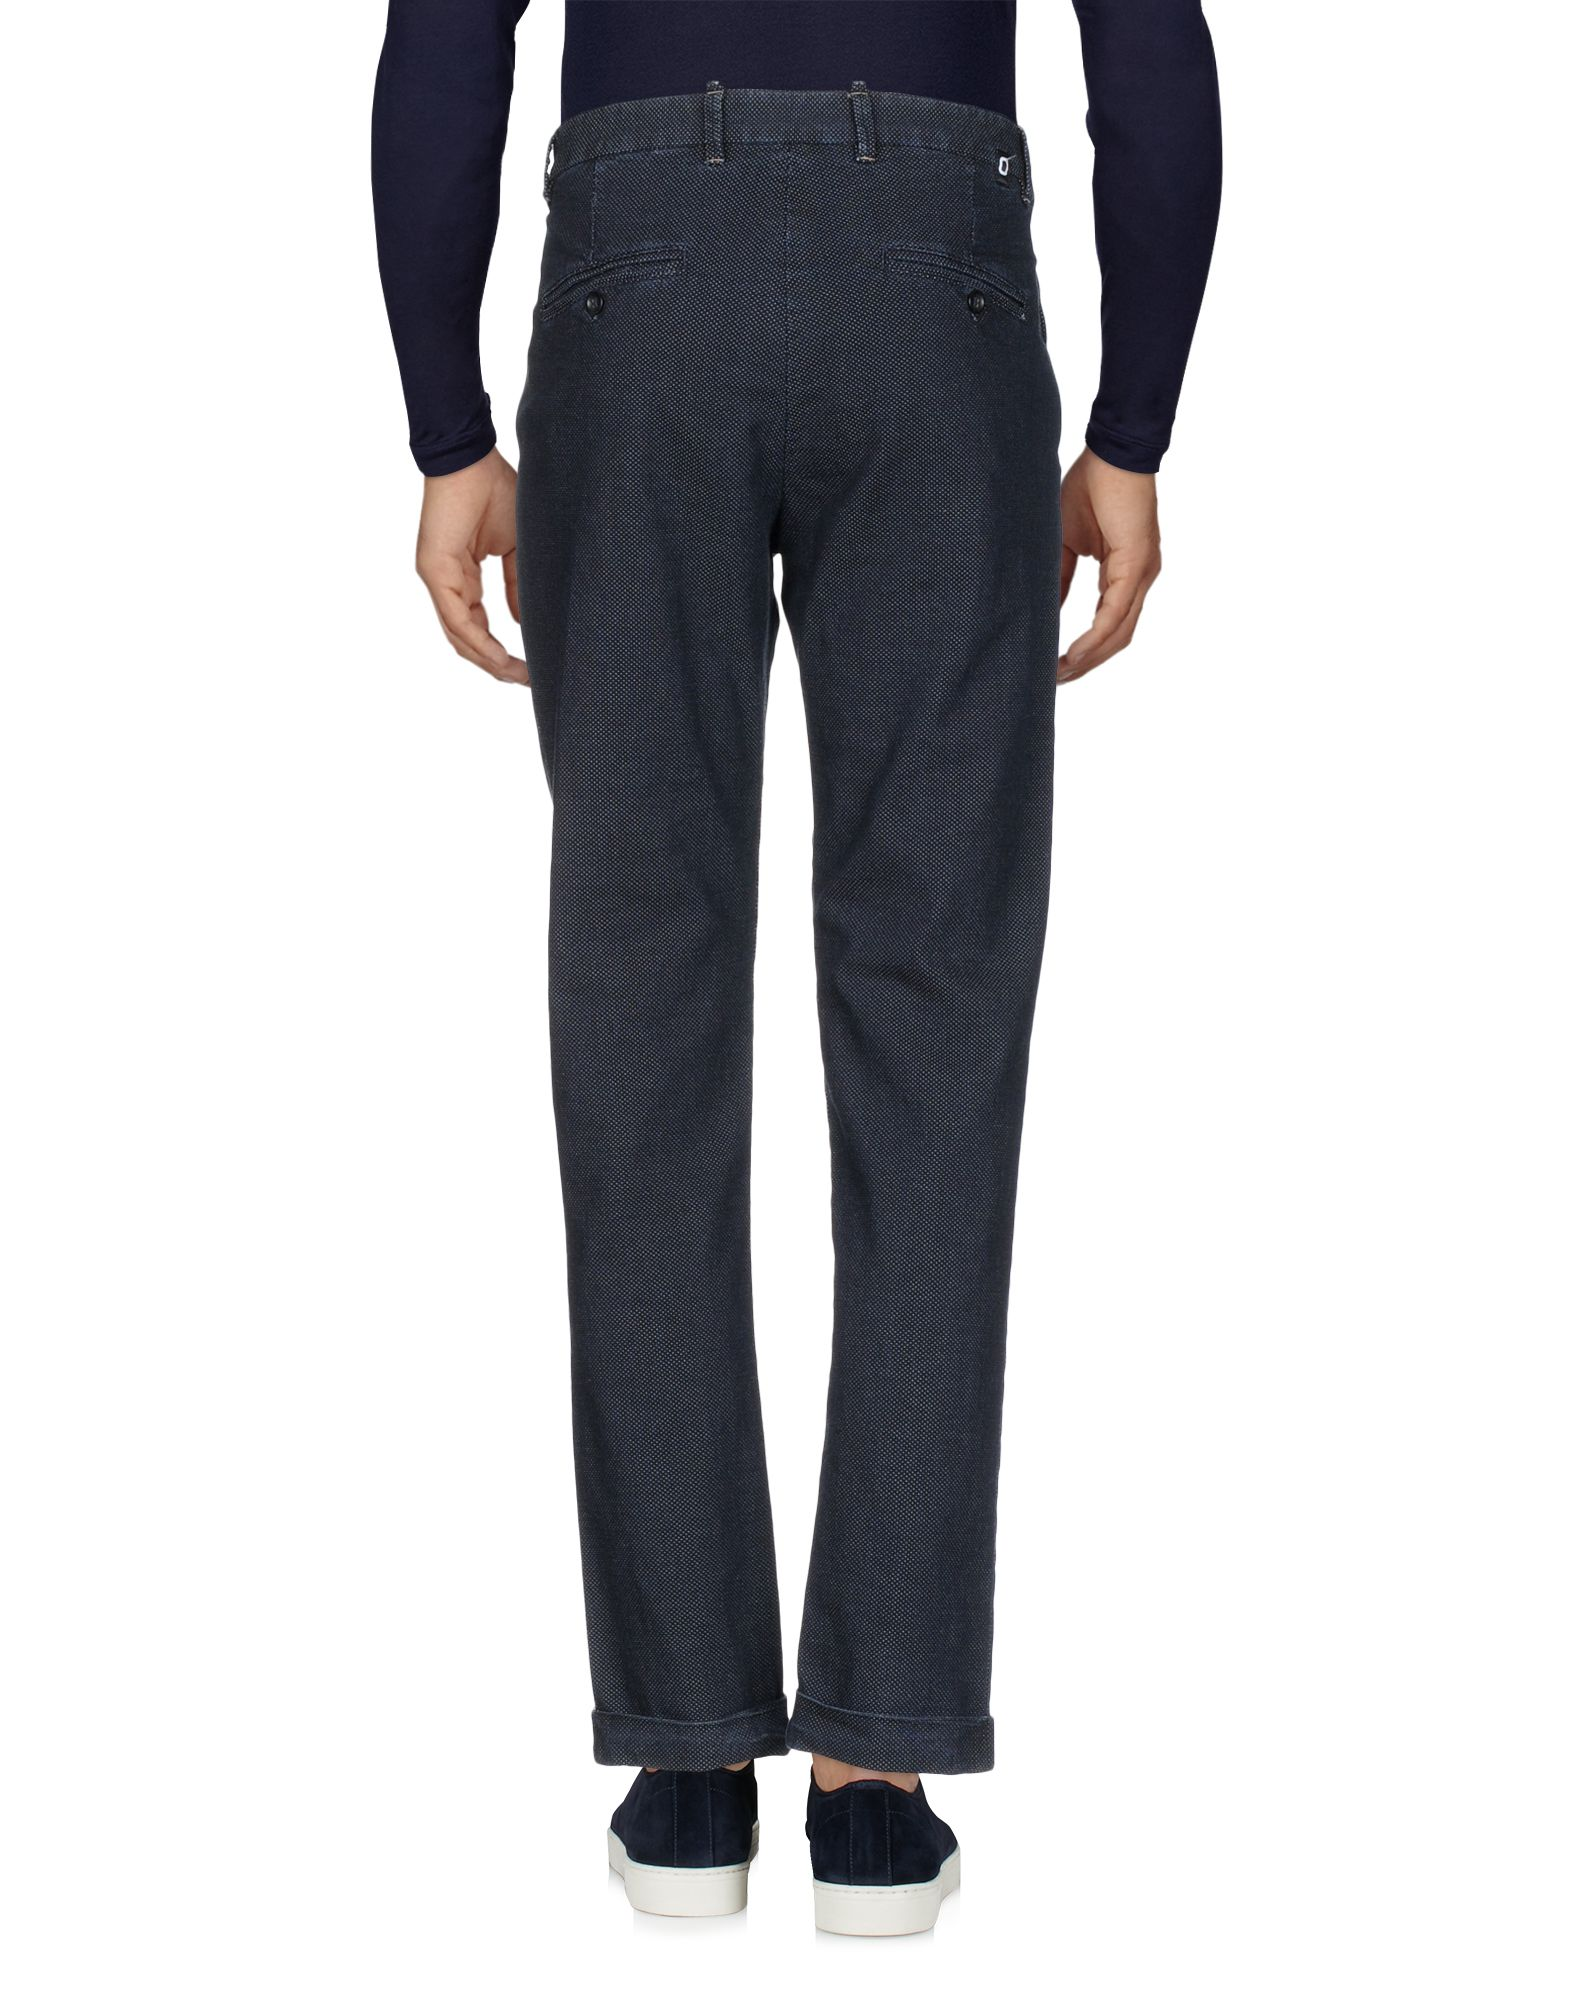 Pantaloni Jeans Officina Uomo 36 Uomo Officina - 42671058QR 1da22a